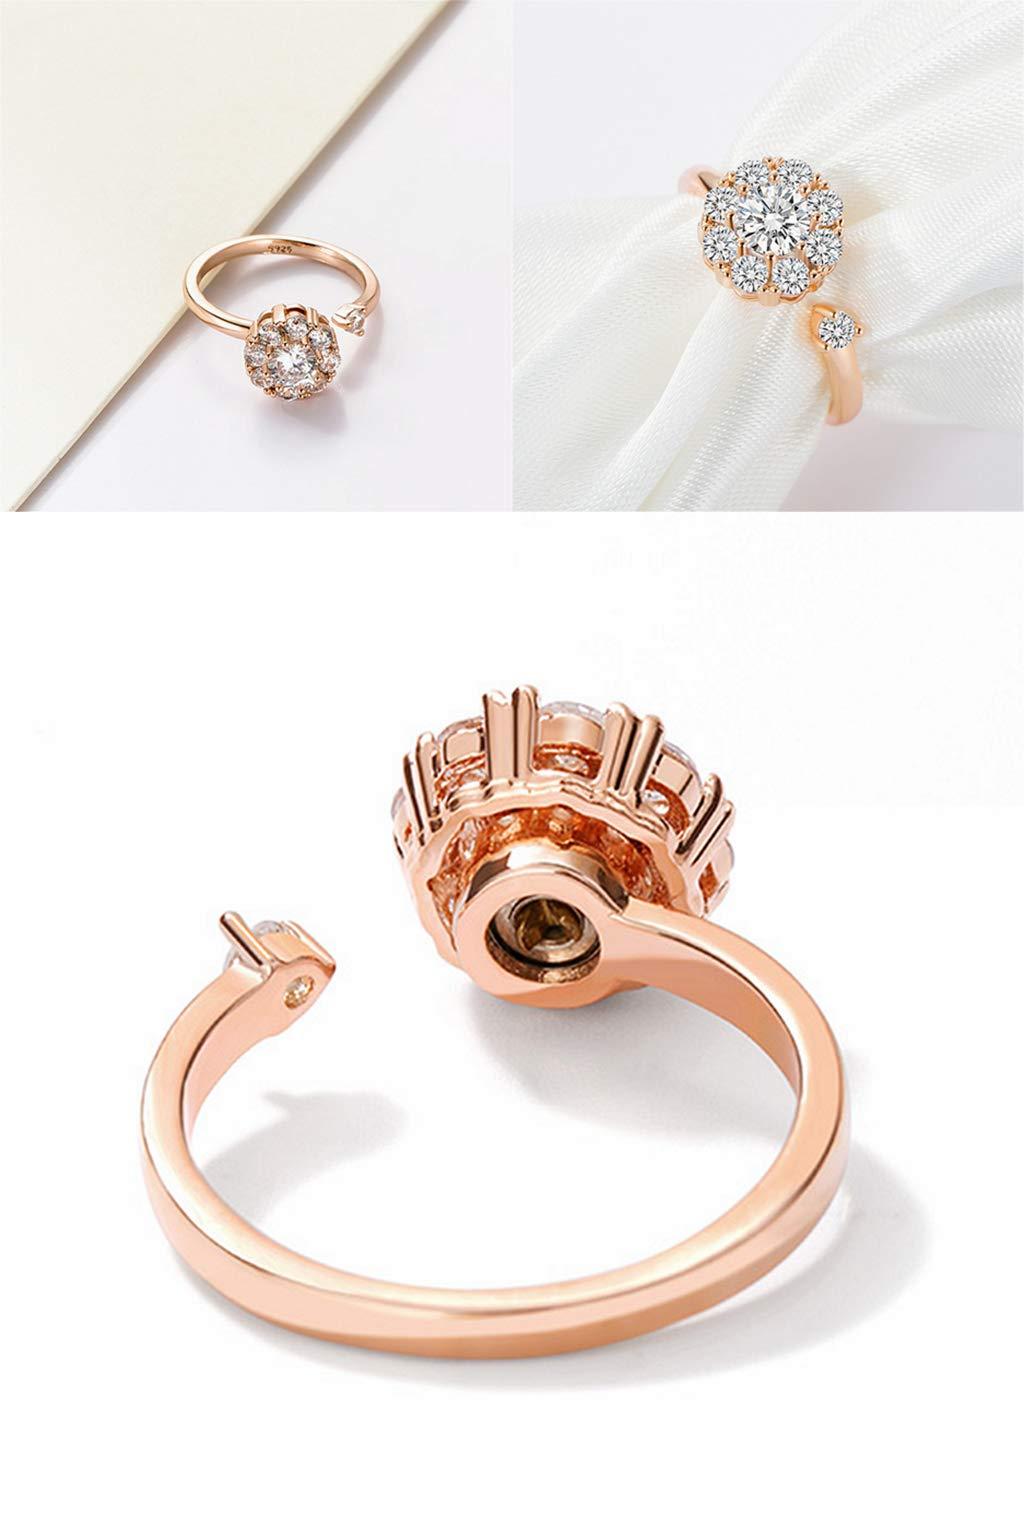 SEWOR Elegant Rotating Rings Adjustable Spinner Diamond Delicate Snowflake Ring for Women Girls, Anti Anxiety,Autism (Rose Gold)